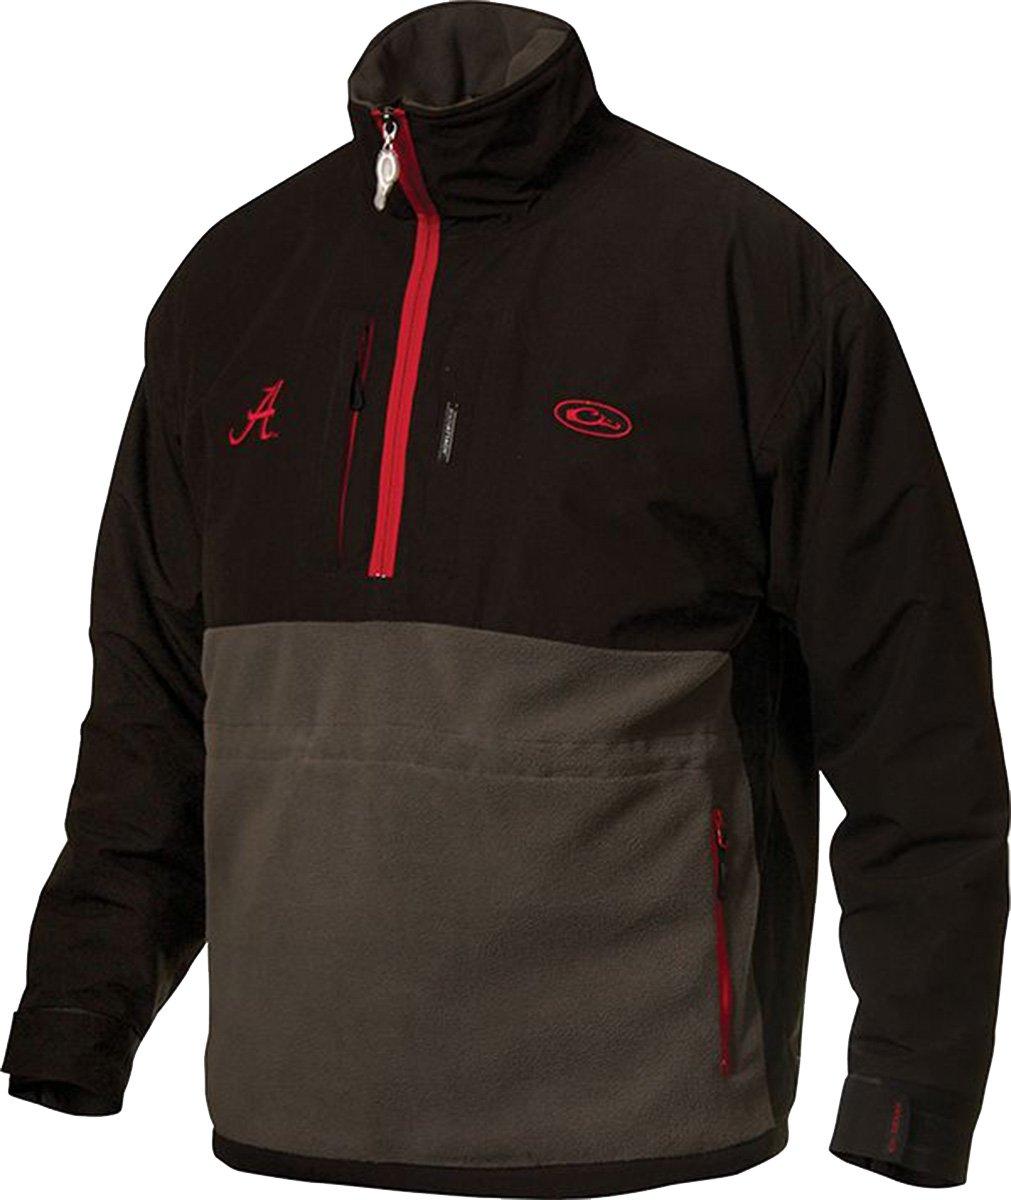 Drake Waterfowl University Of Alabama Eqwader 1/4 Zip Jacket-medium by Drake Clothing Company